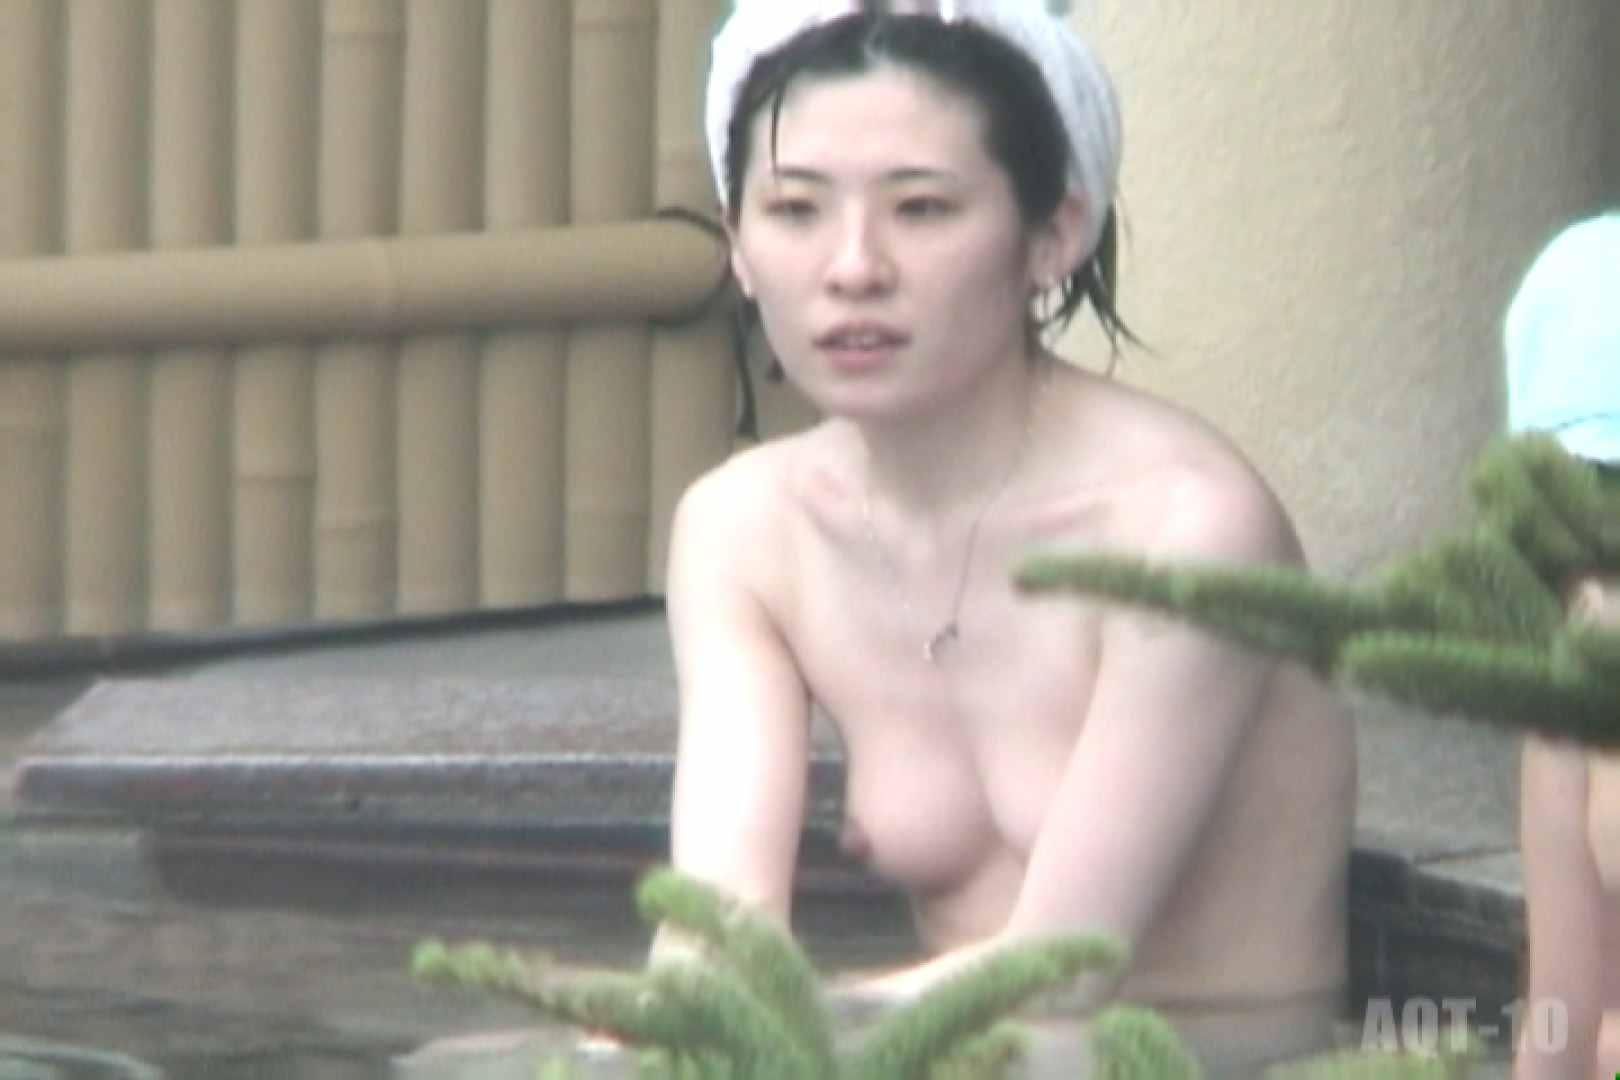 Aquaな露天風呂Vol.793 盗撮シリーズ   露天風呂編  93PIX 79